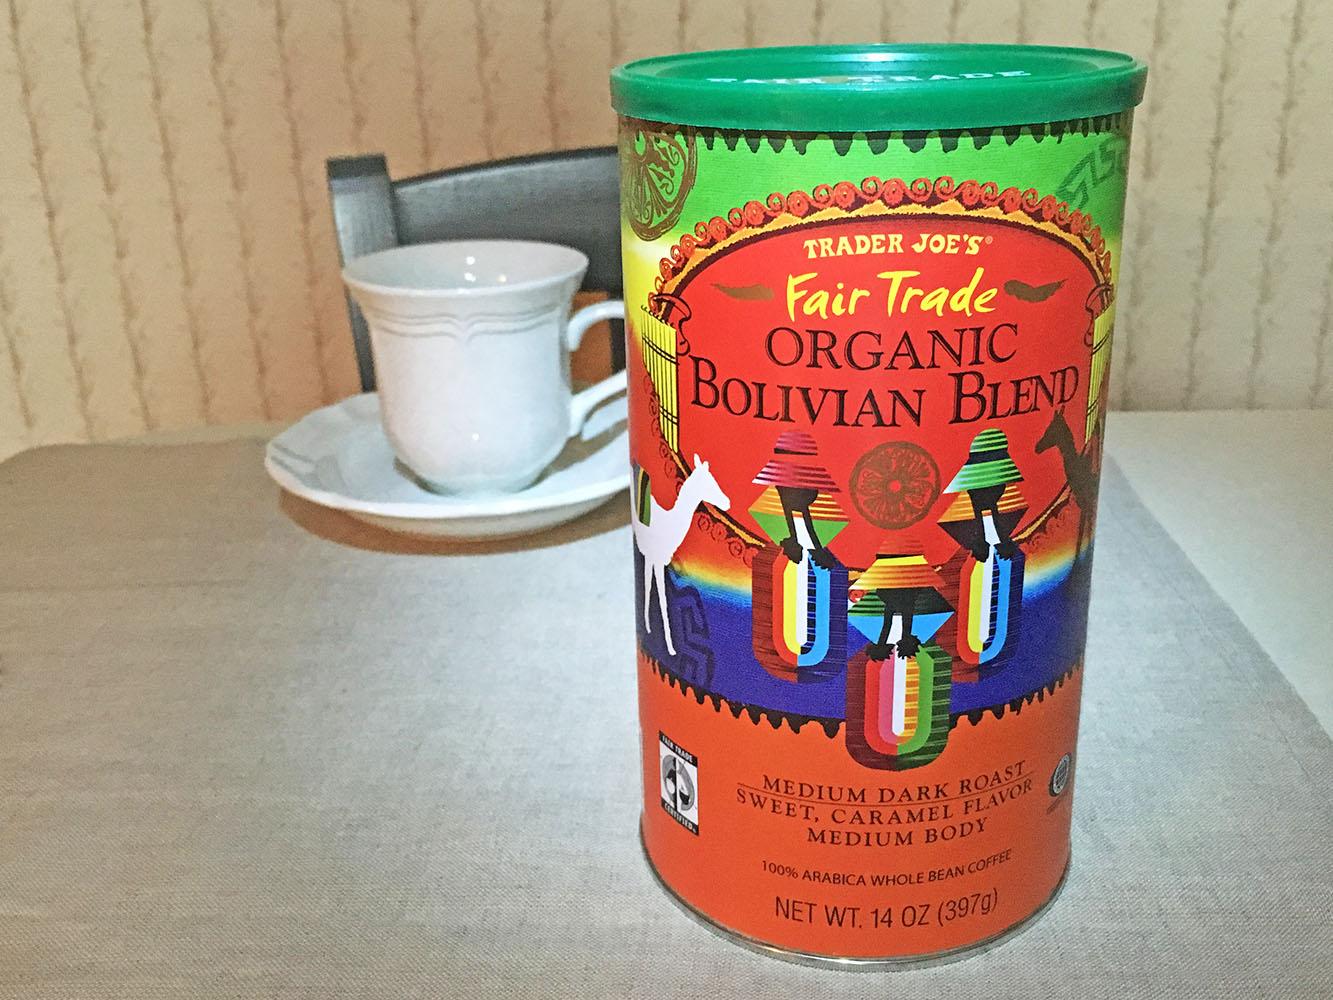 Trader Joes Fair Trade Organic Bolivian Blend